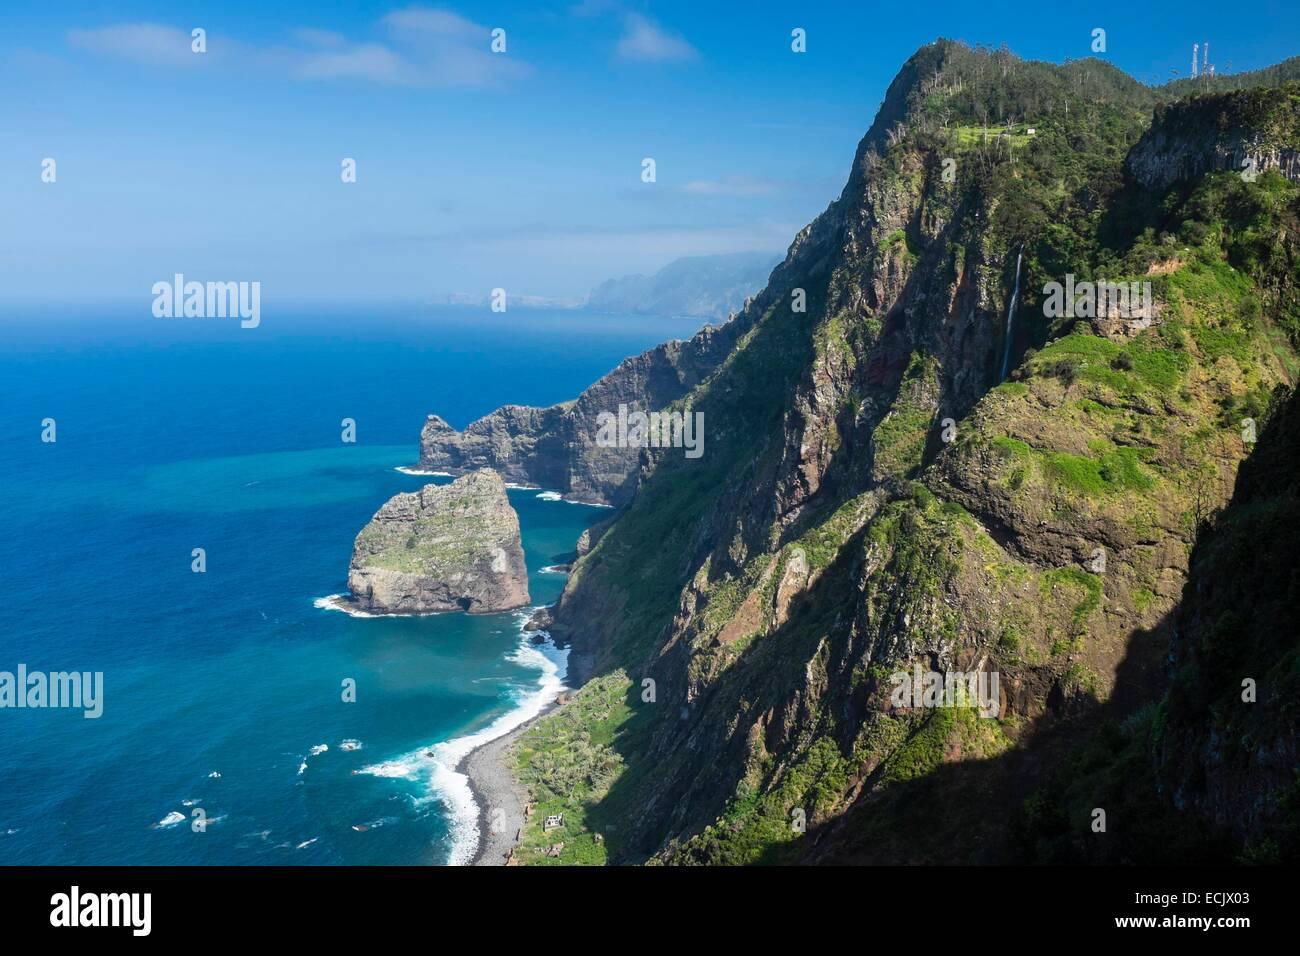 Portugal, Madeira island, Santana on the north coast, Rocha do Navio Nature Reserve Stock Photo